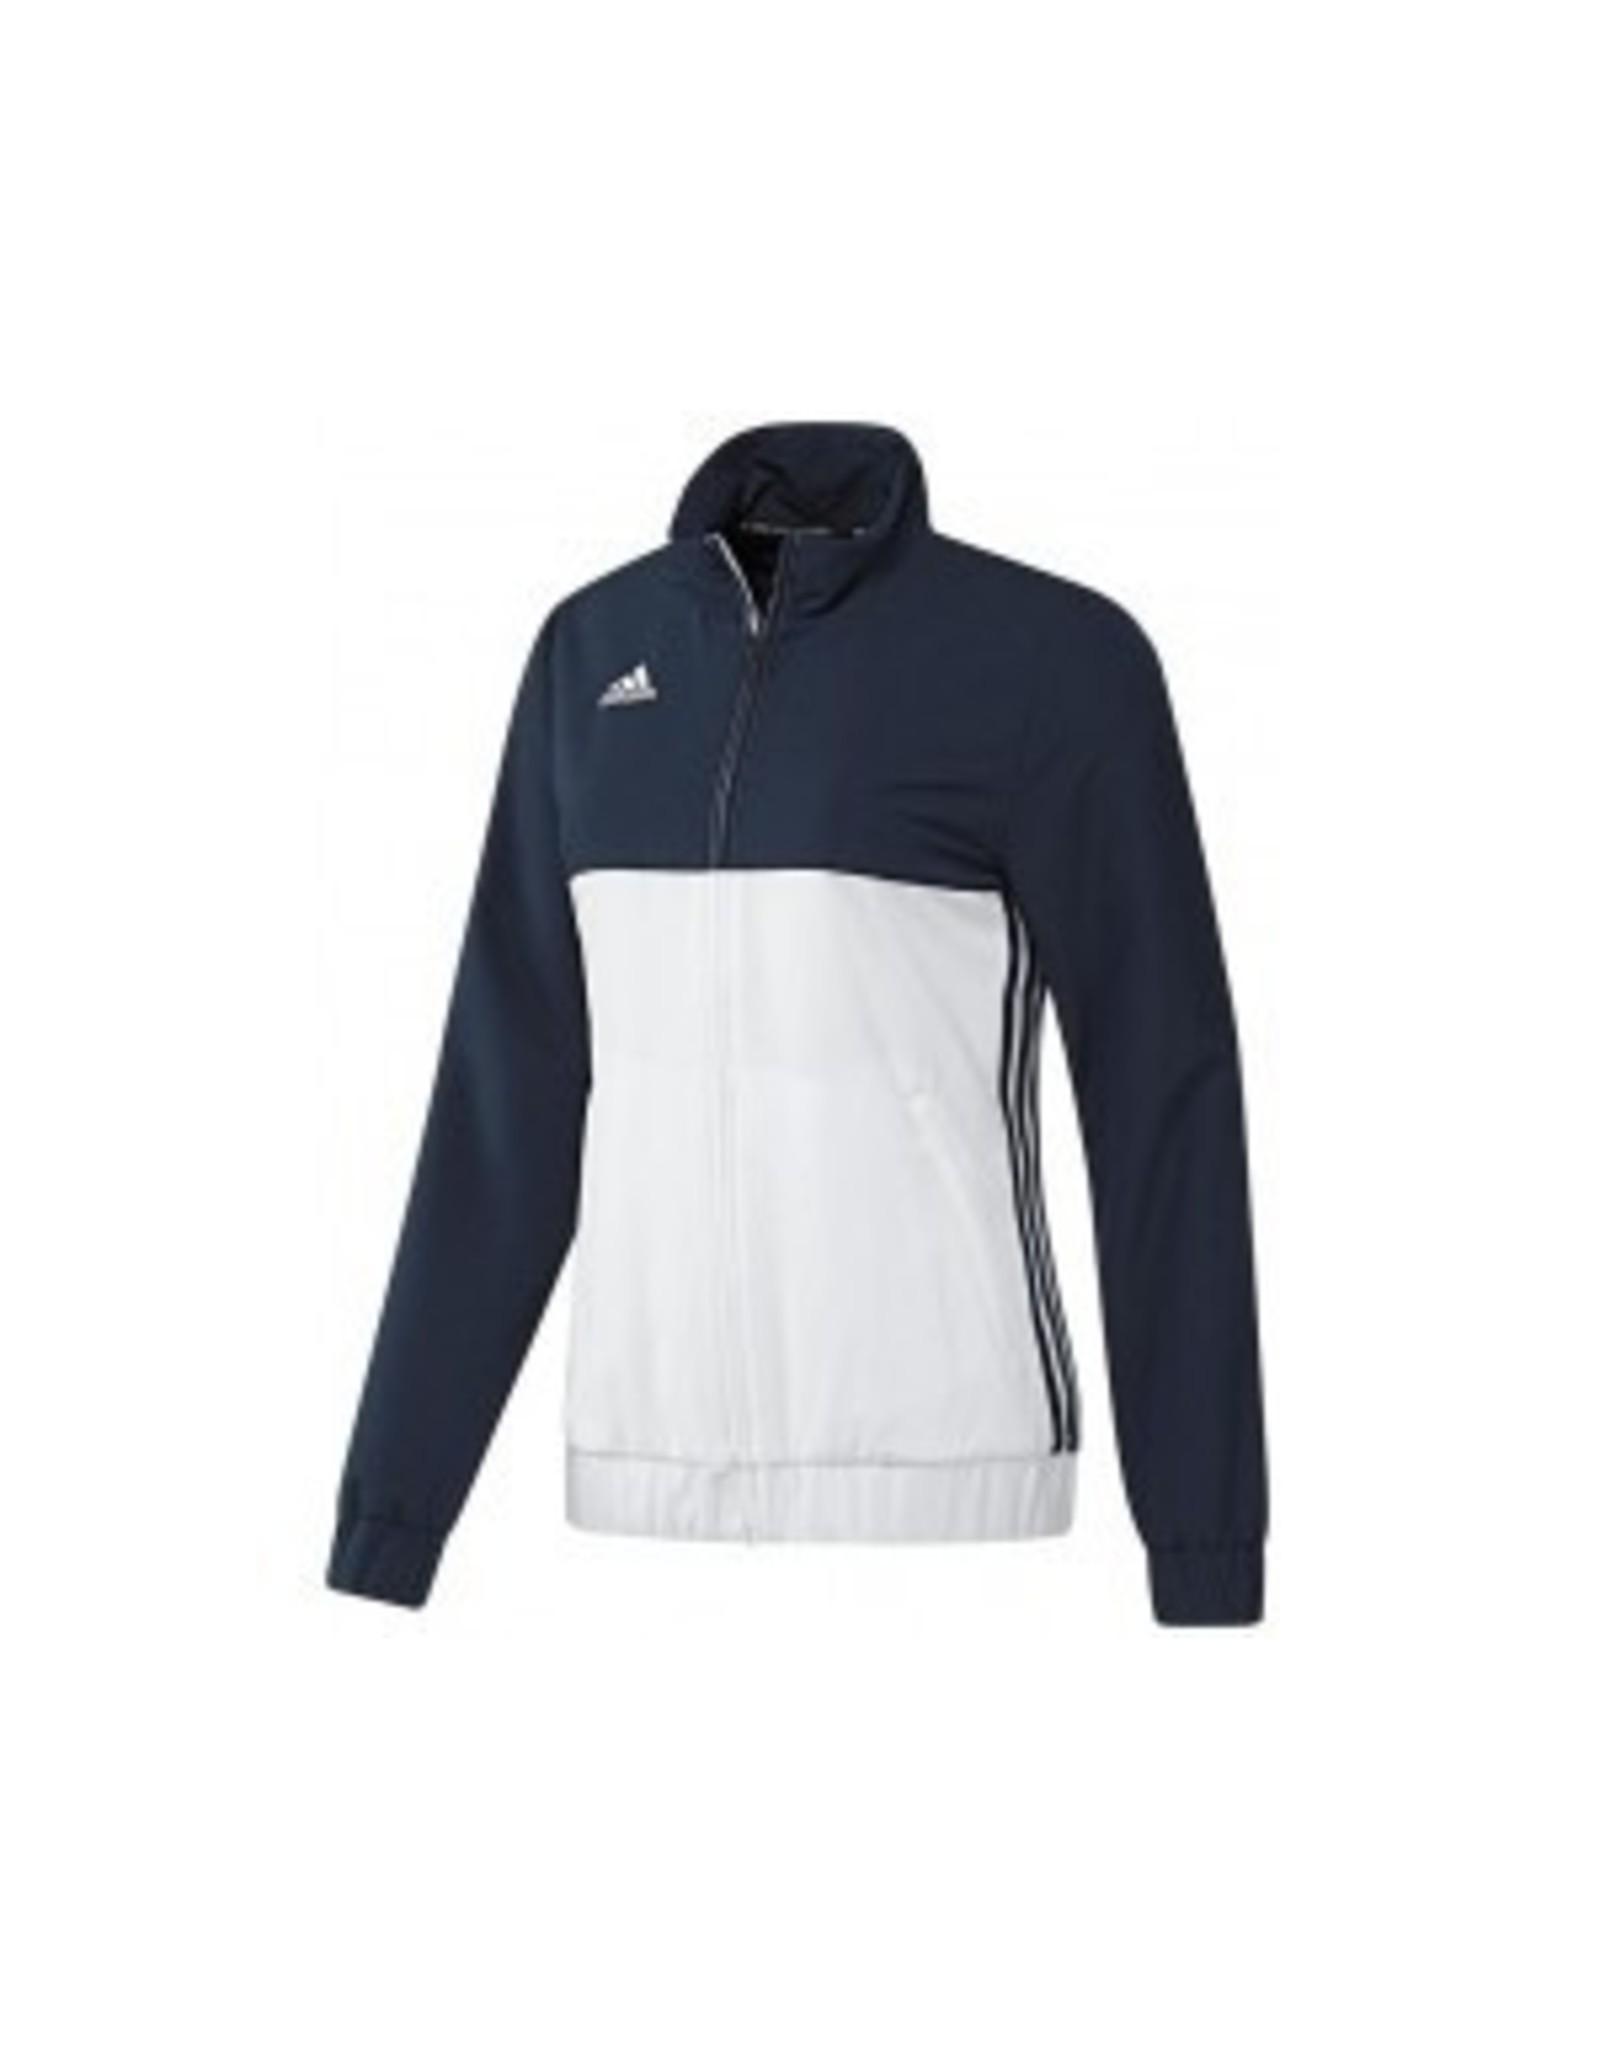 Adidas T16 Team Jacket Men & Kids